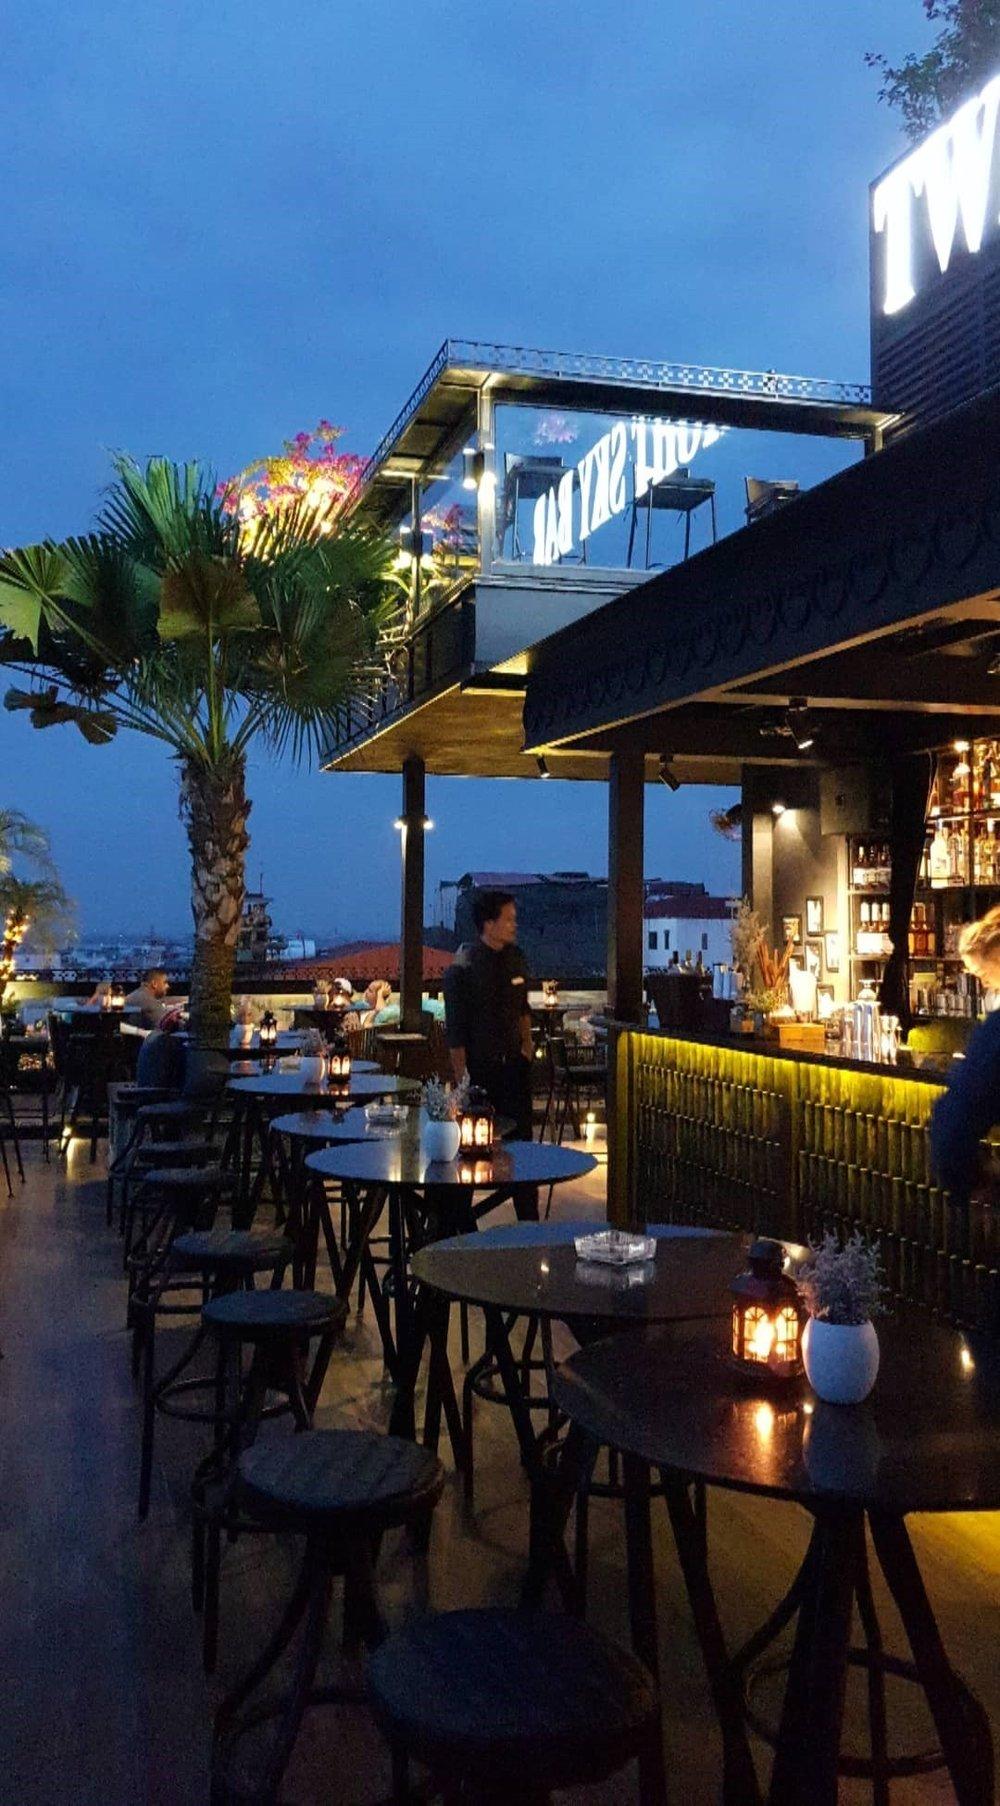 twilight-sky-bar-hanoi-vietnam-2019.jpg